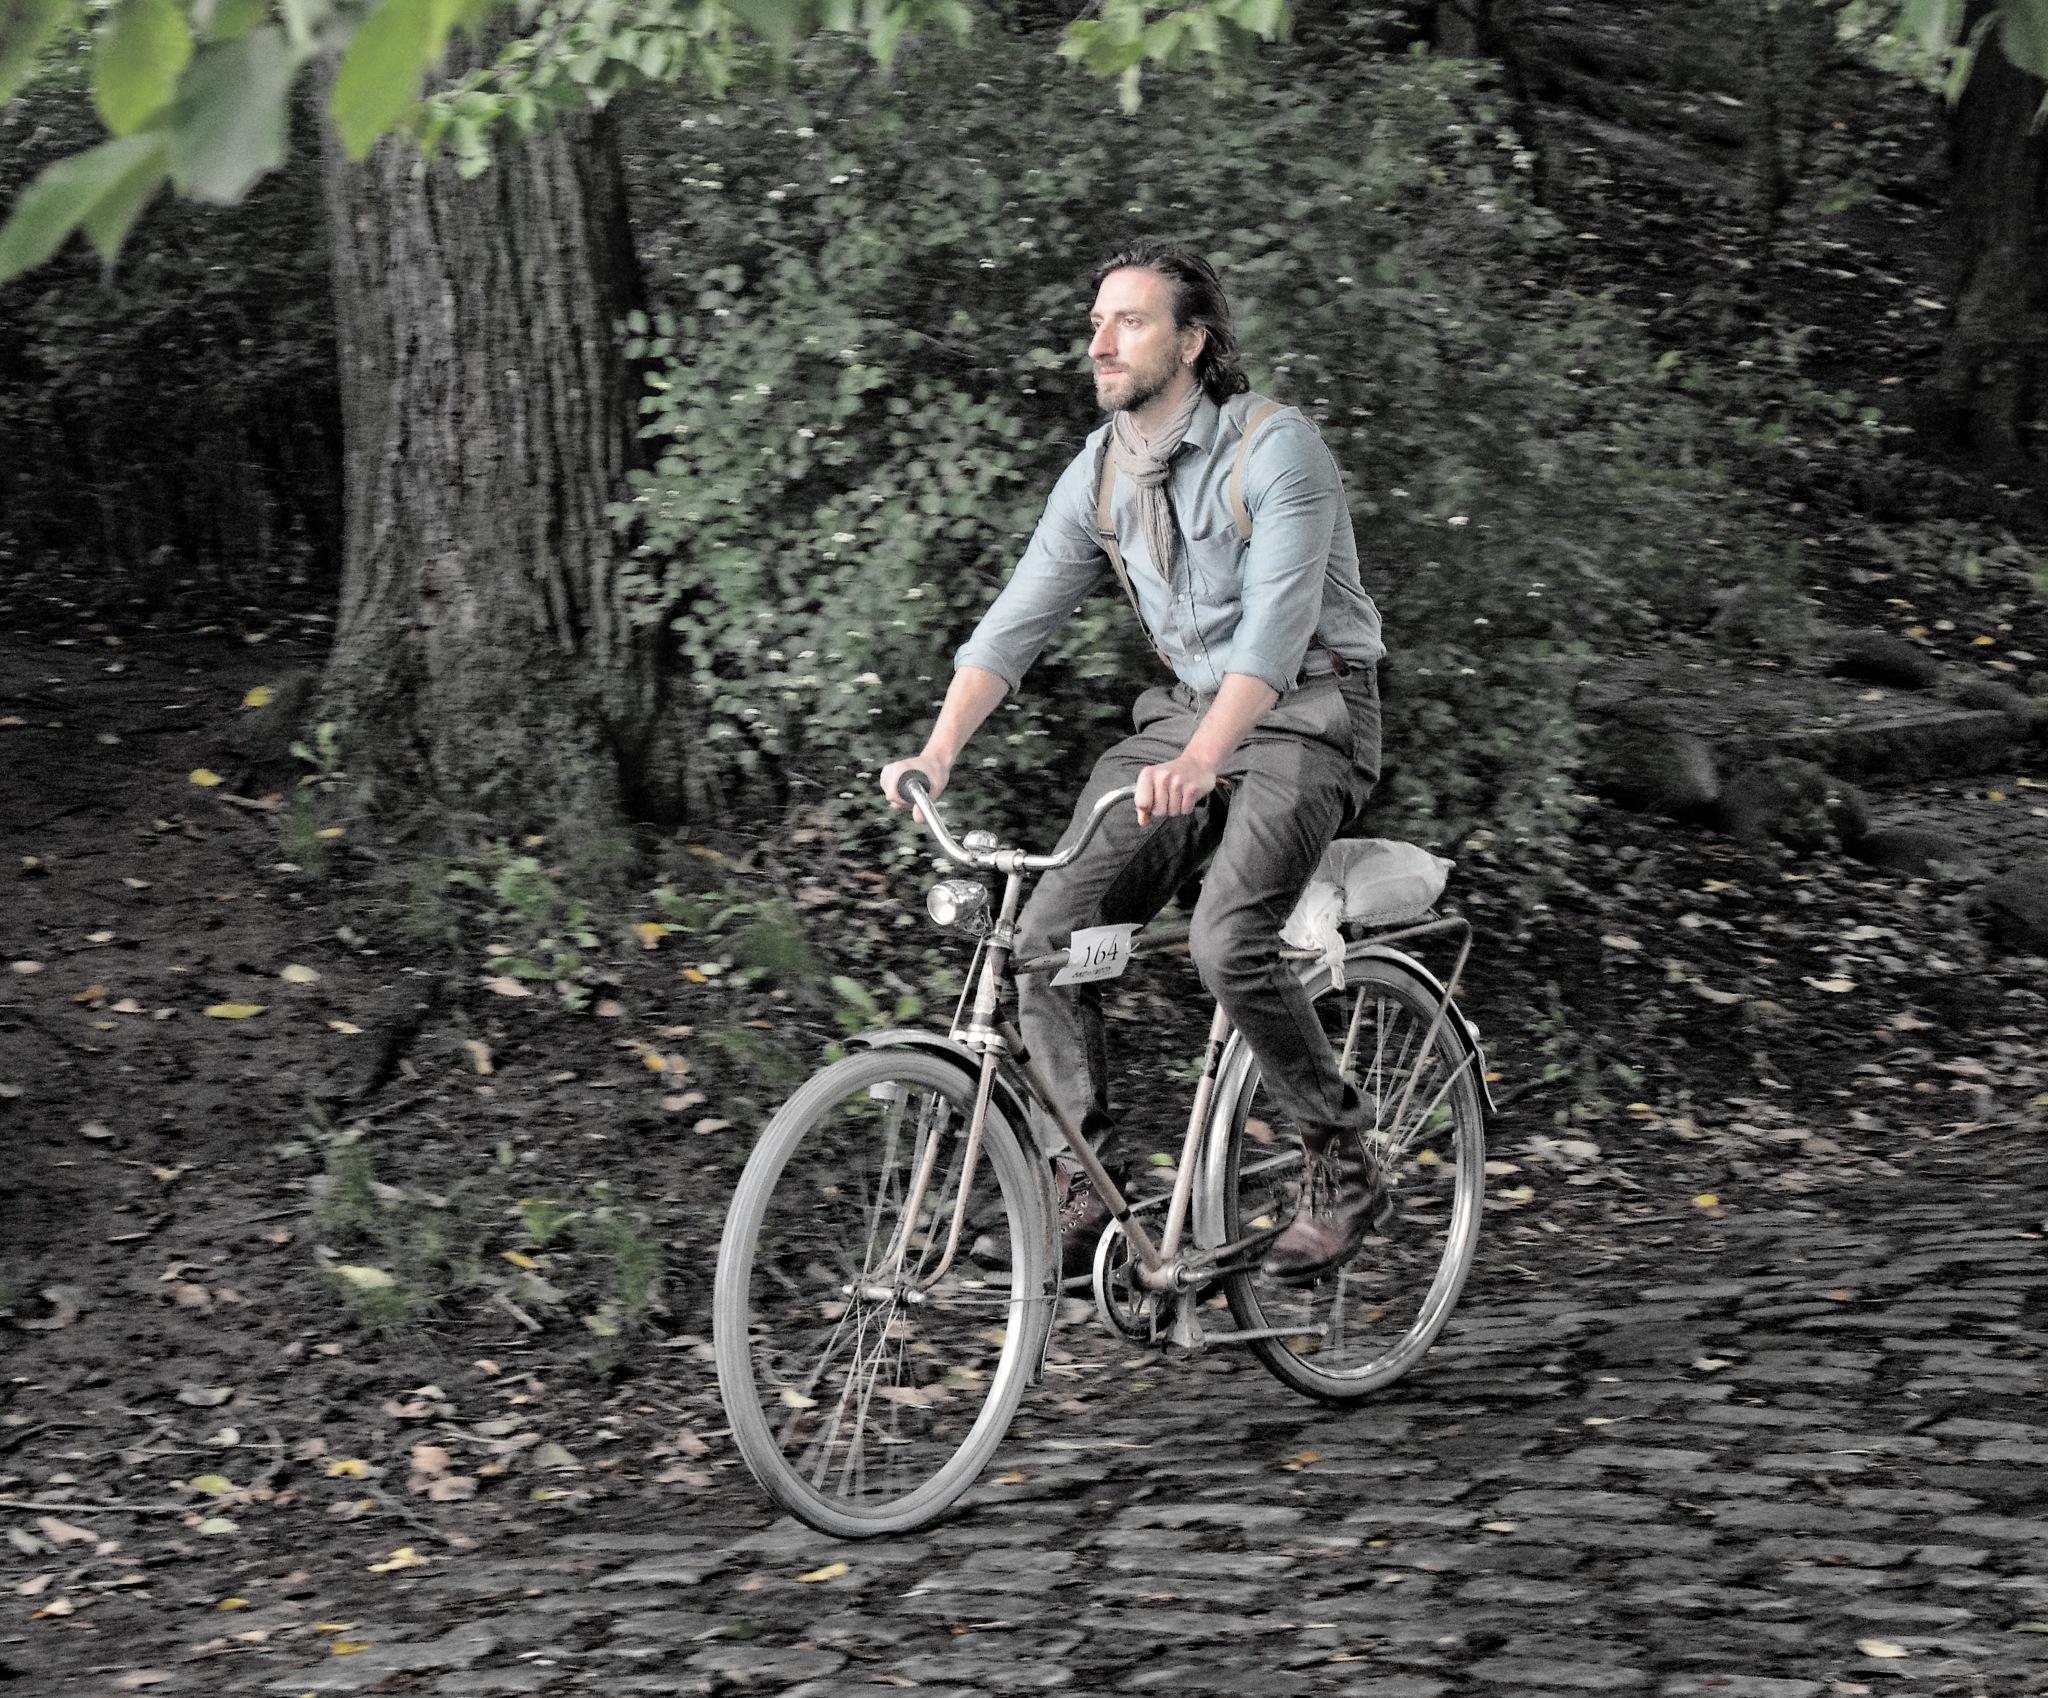 The Cyclist  by Ove Bogart Gunnarsson